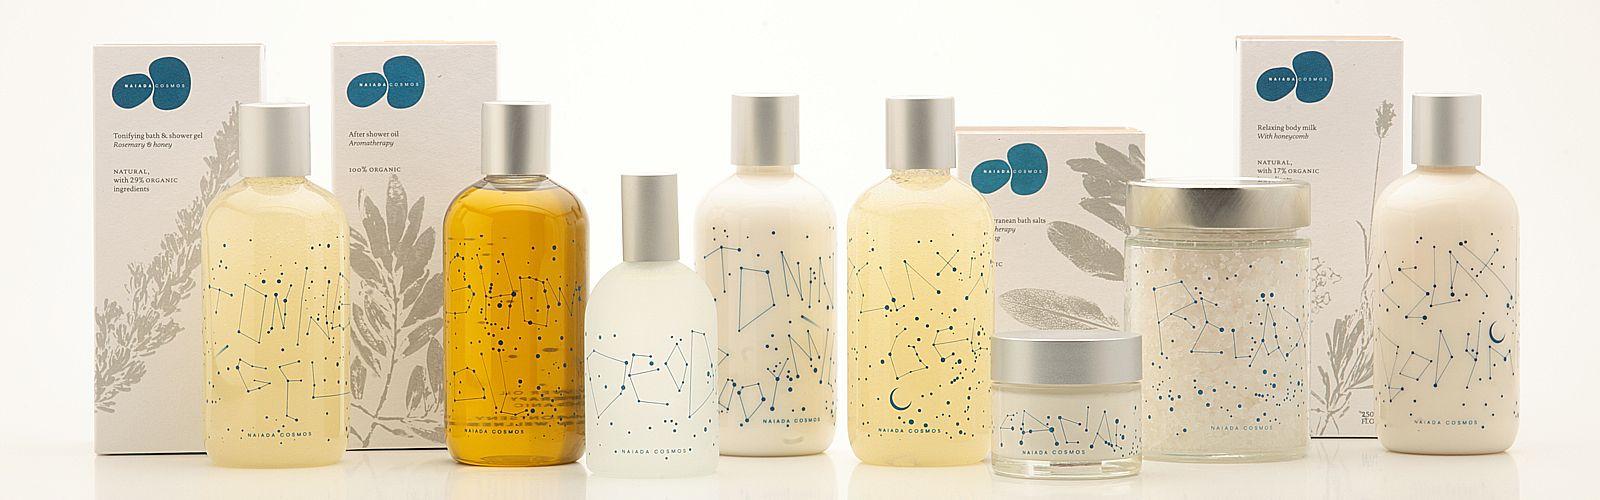 Fragancies del montseny natural and organic cosmetics - cosmos certified.